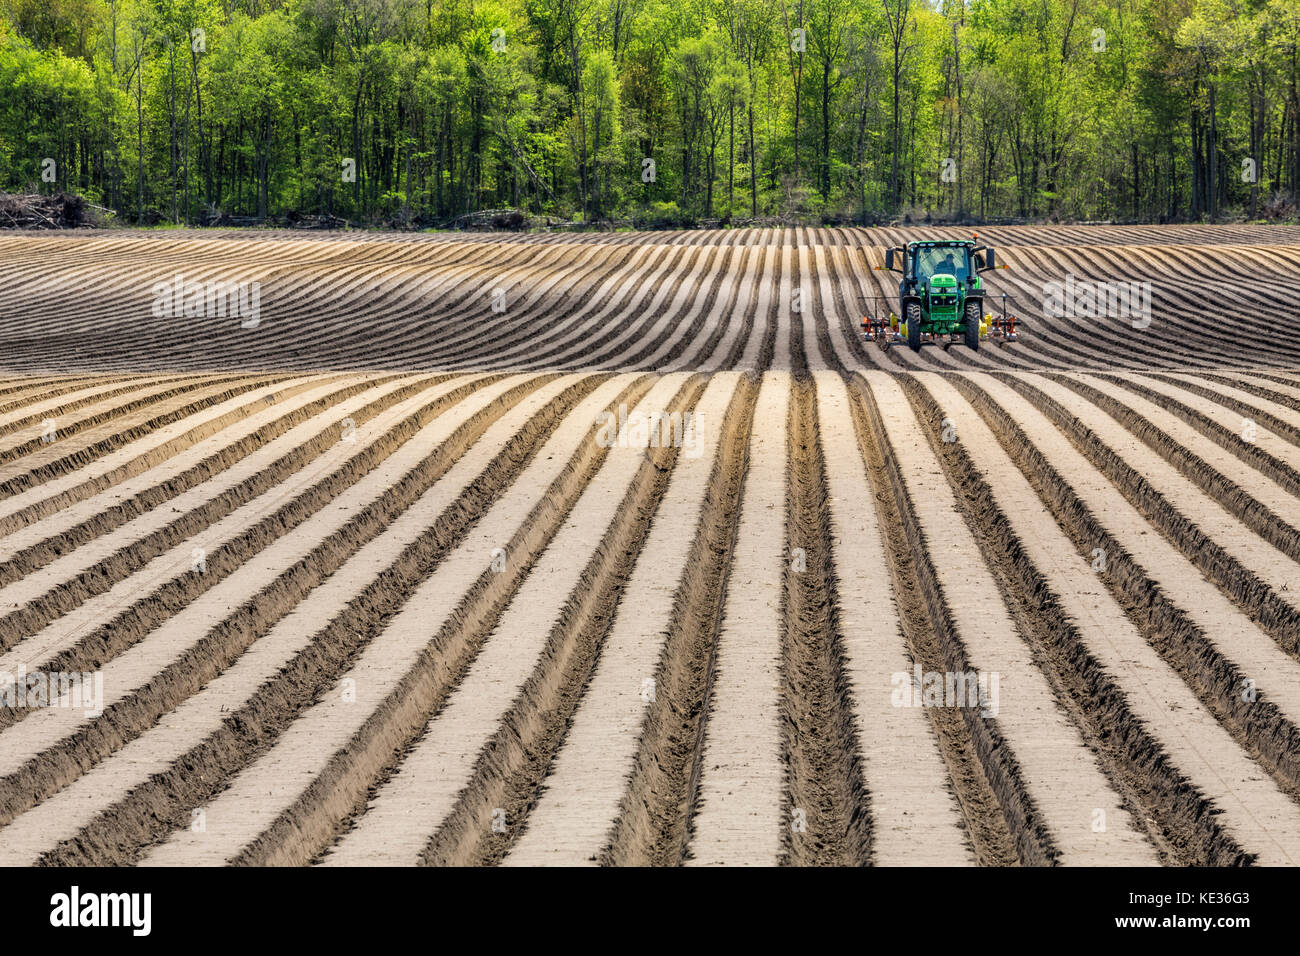 Mechanized crop planting, Newbury, Ontario, Canada - Stock Image